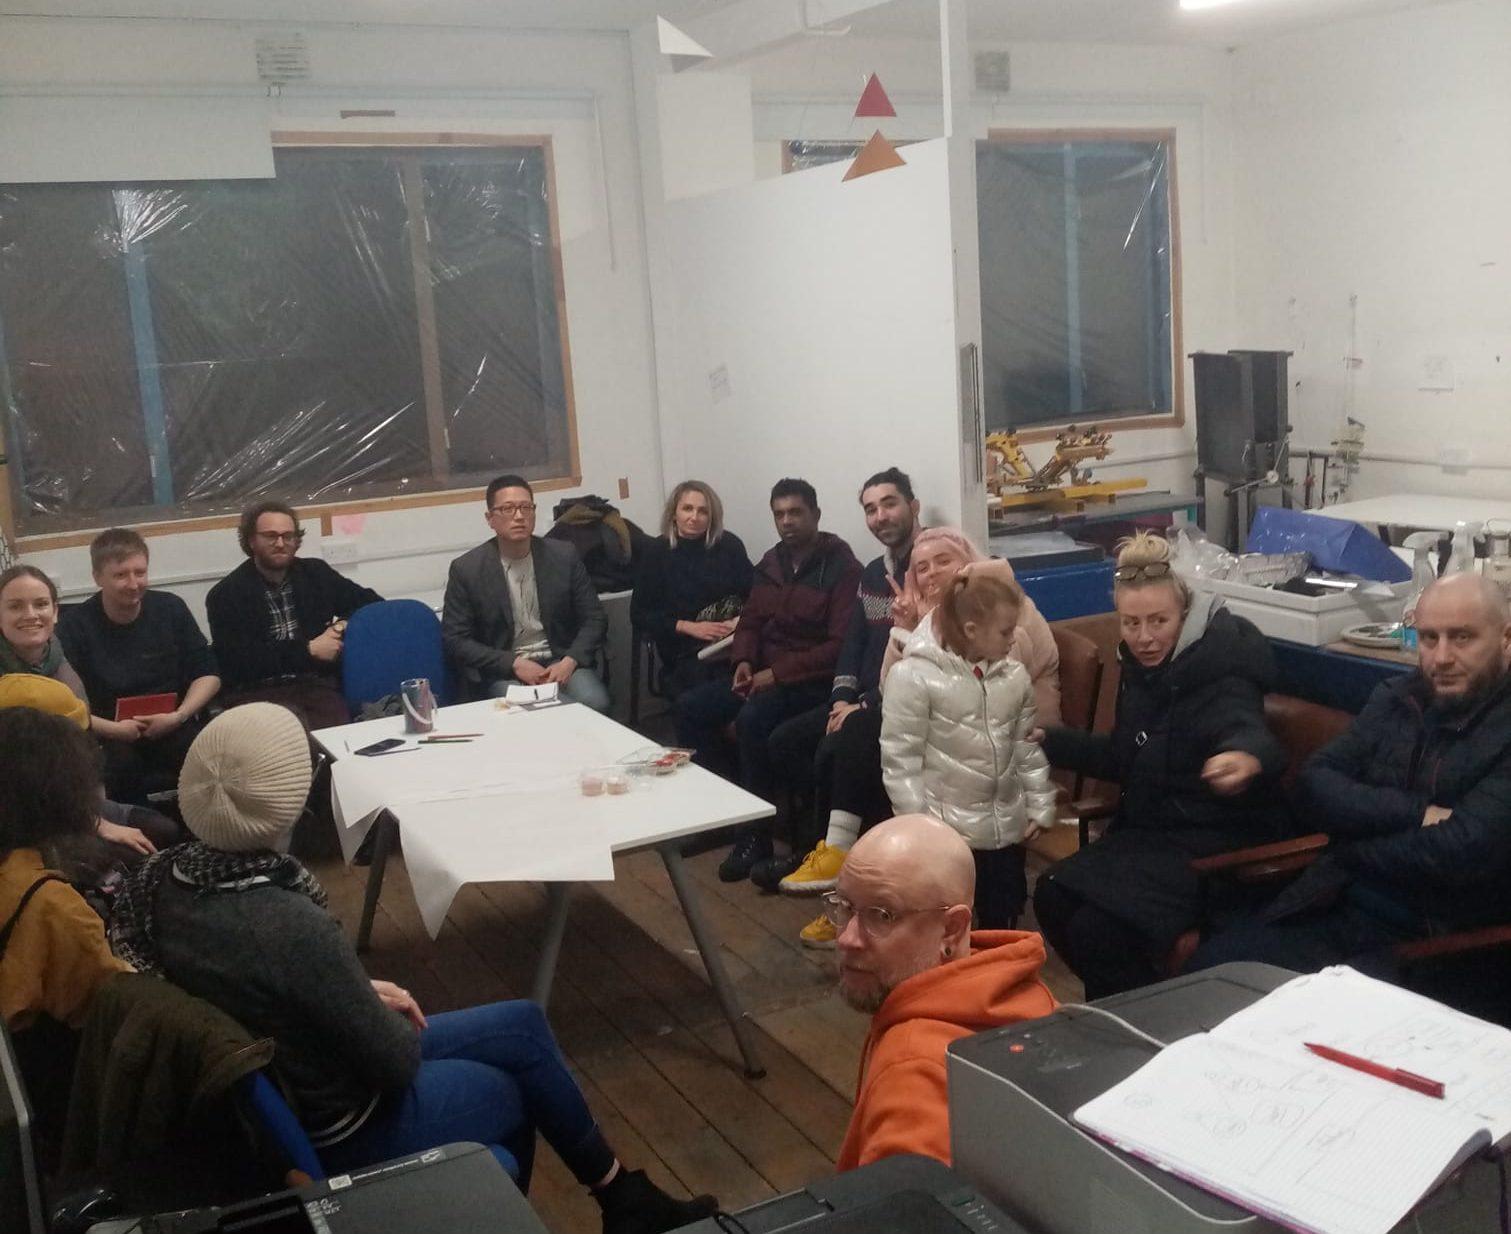 Local Dorset St/Mountjoy planning meeting